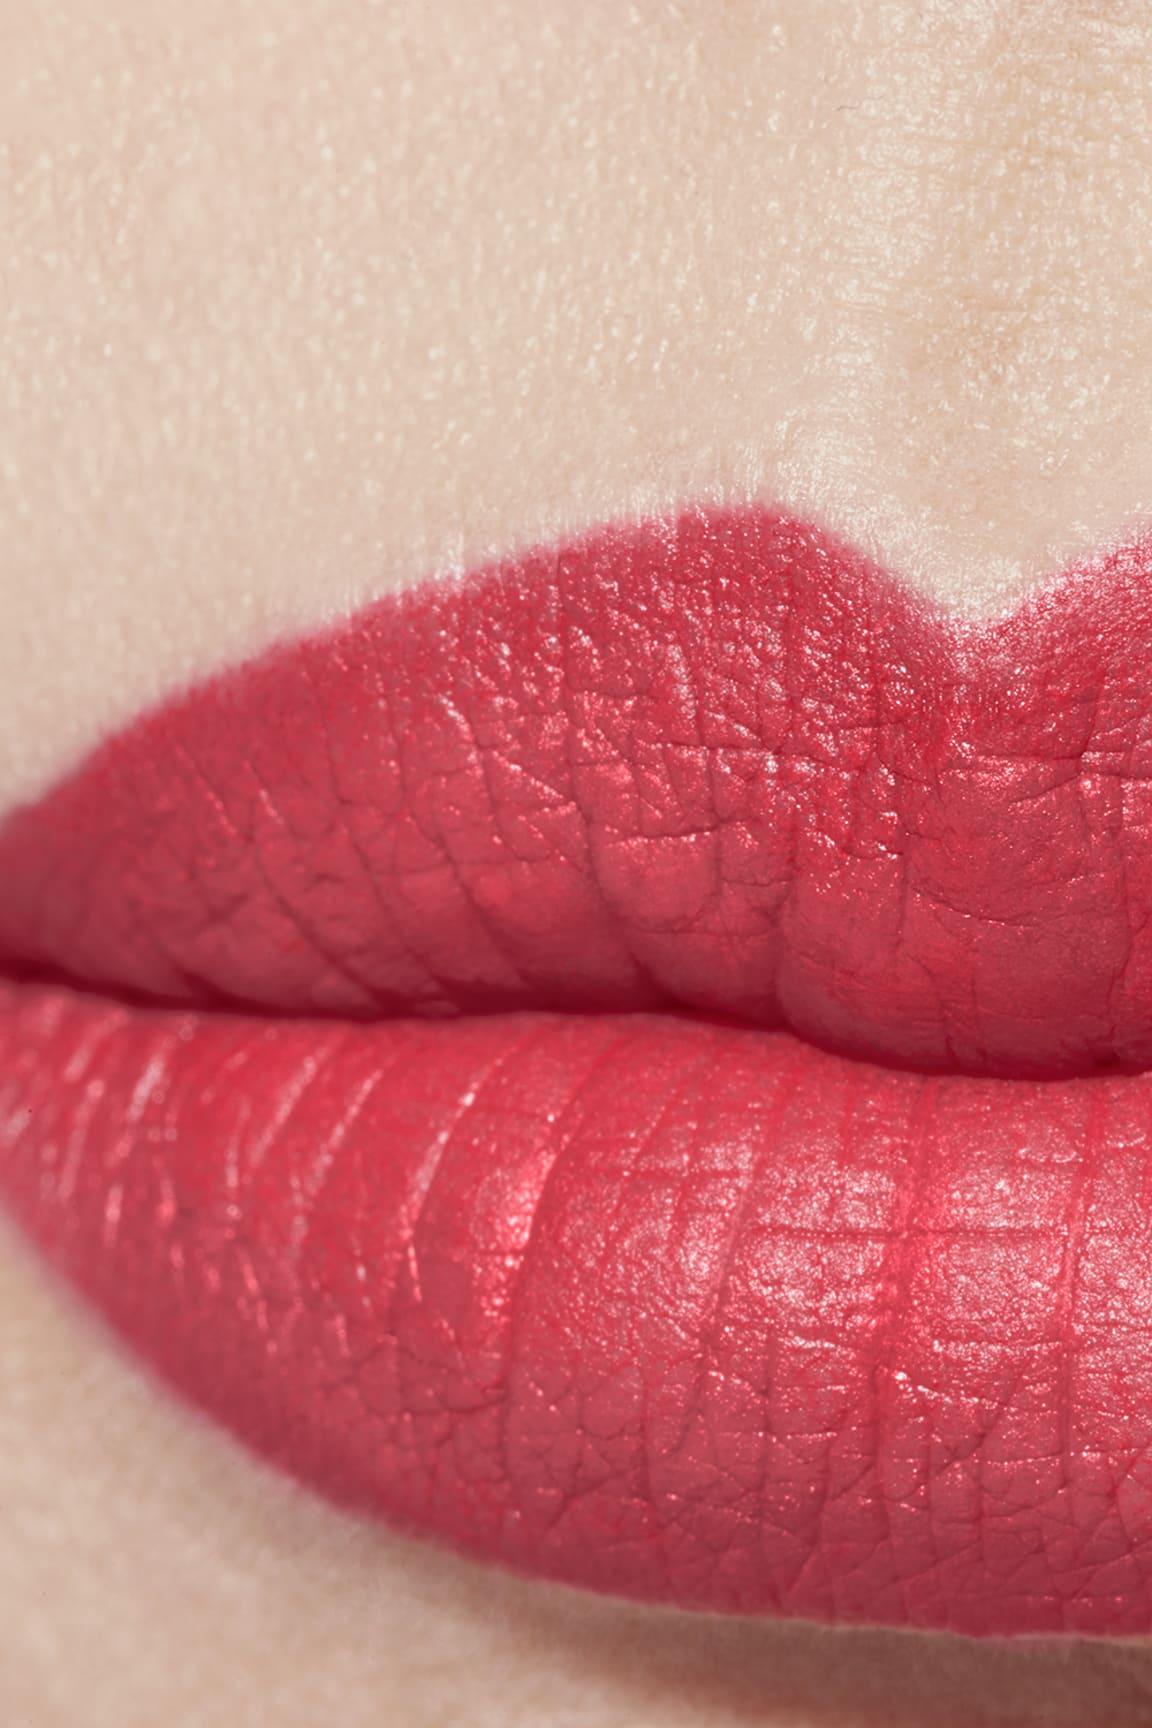 Application makeup visual 1 - ROUGE ALLURE VELVET 66 - L'INDOMABILE